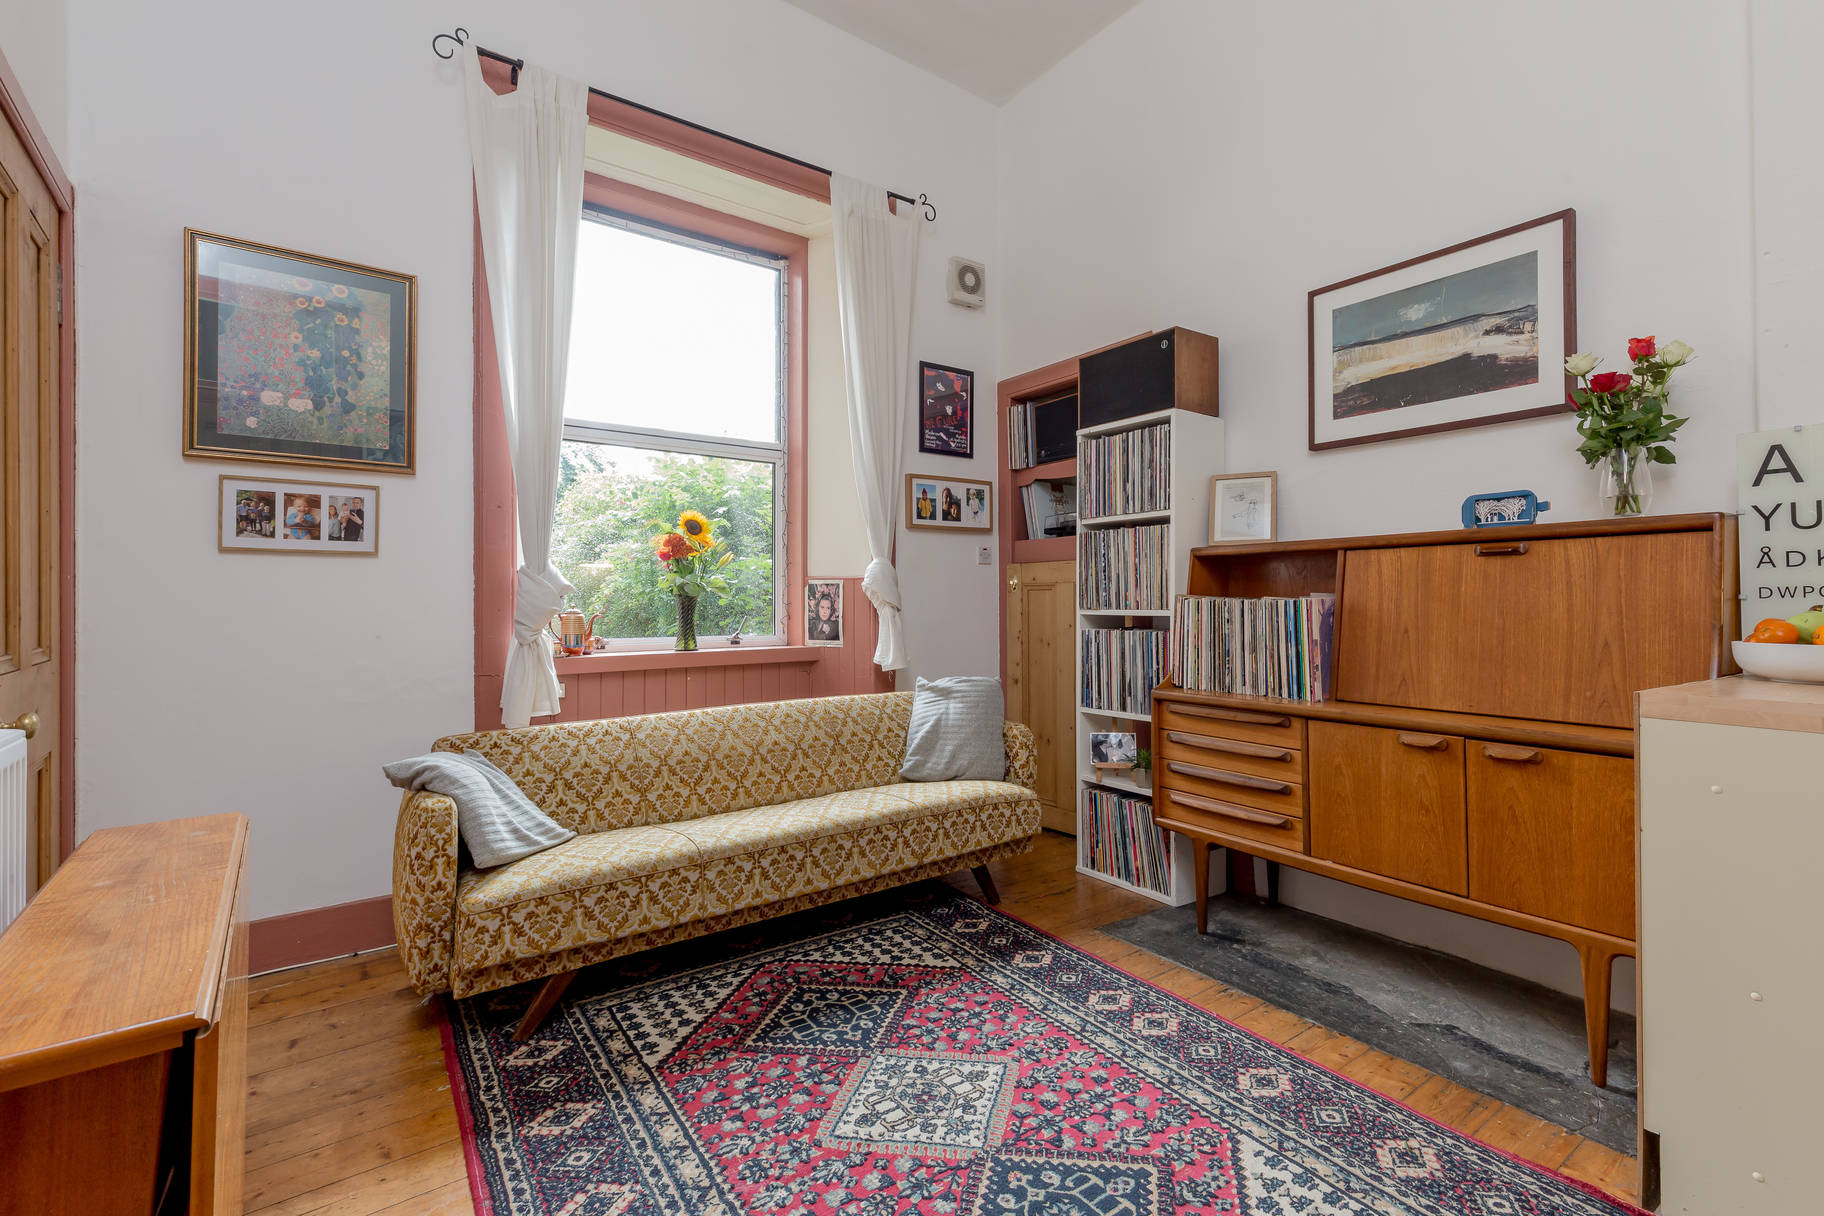 35/2 Balfour Street, Edinburgh, EH6 5DL